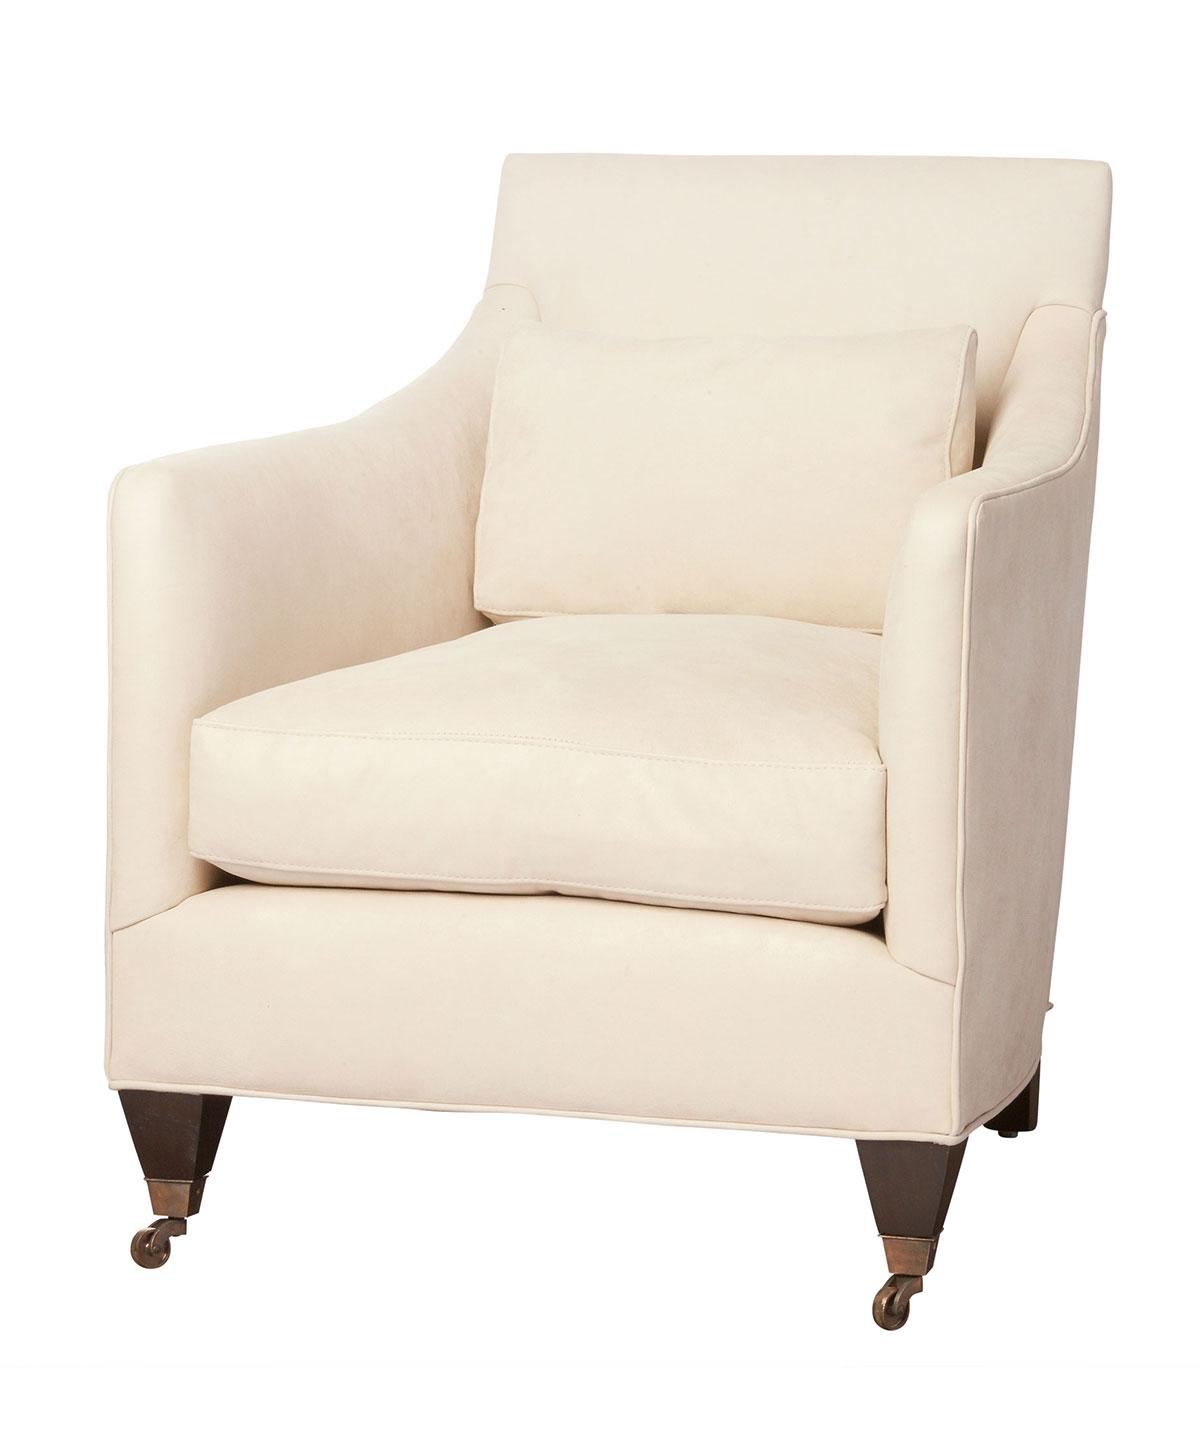 Charles Chair